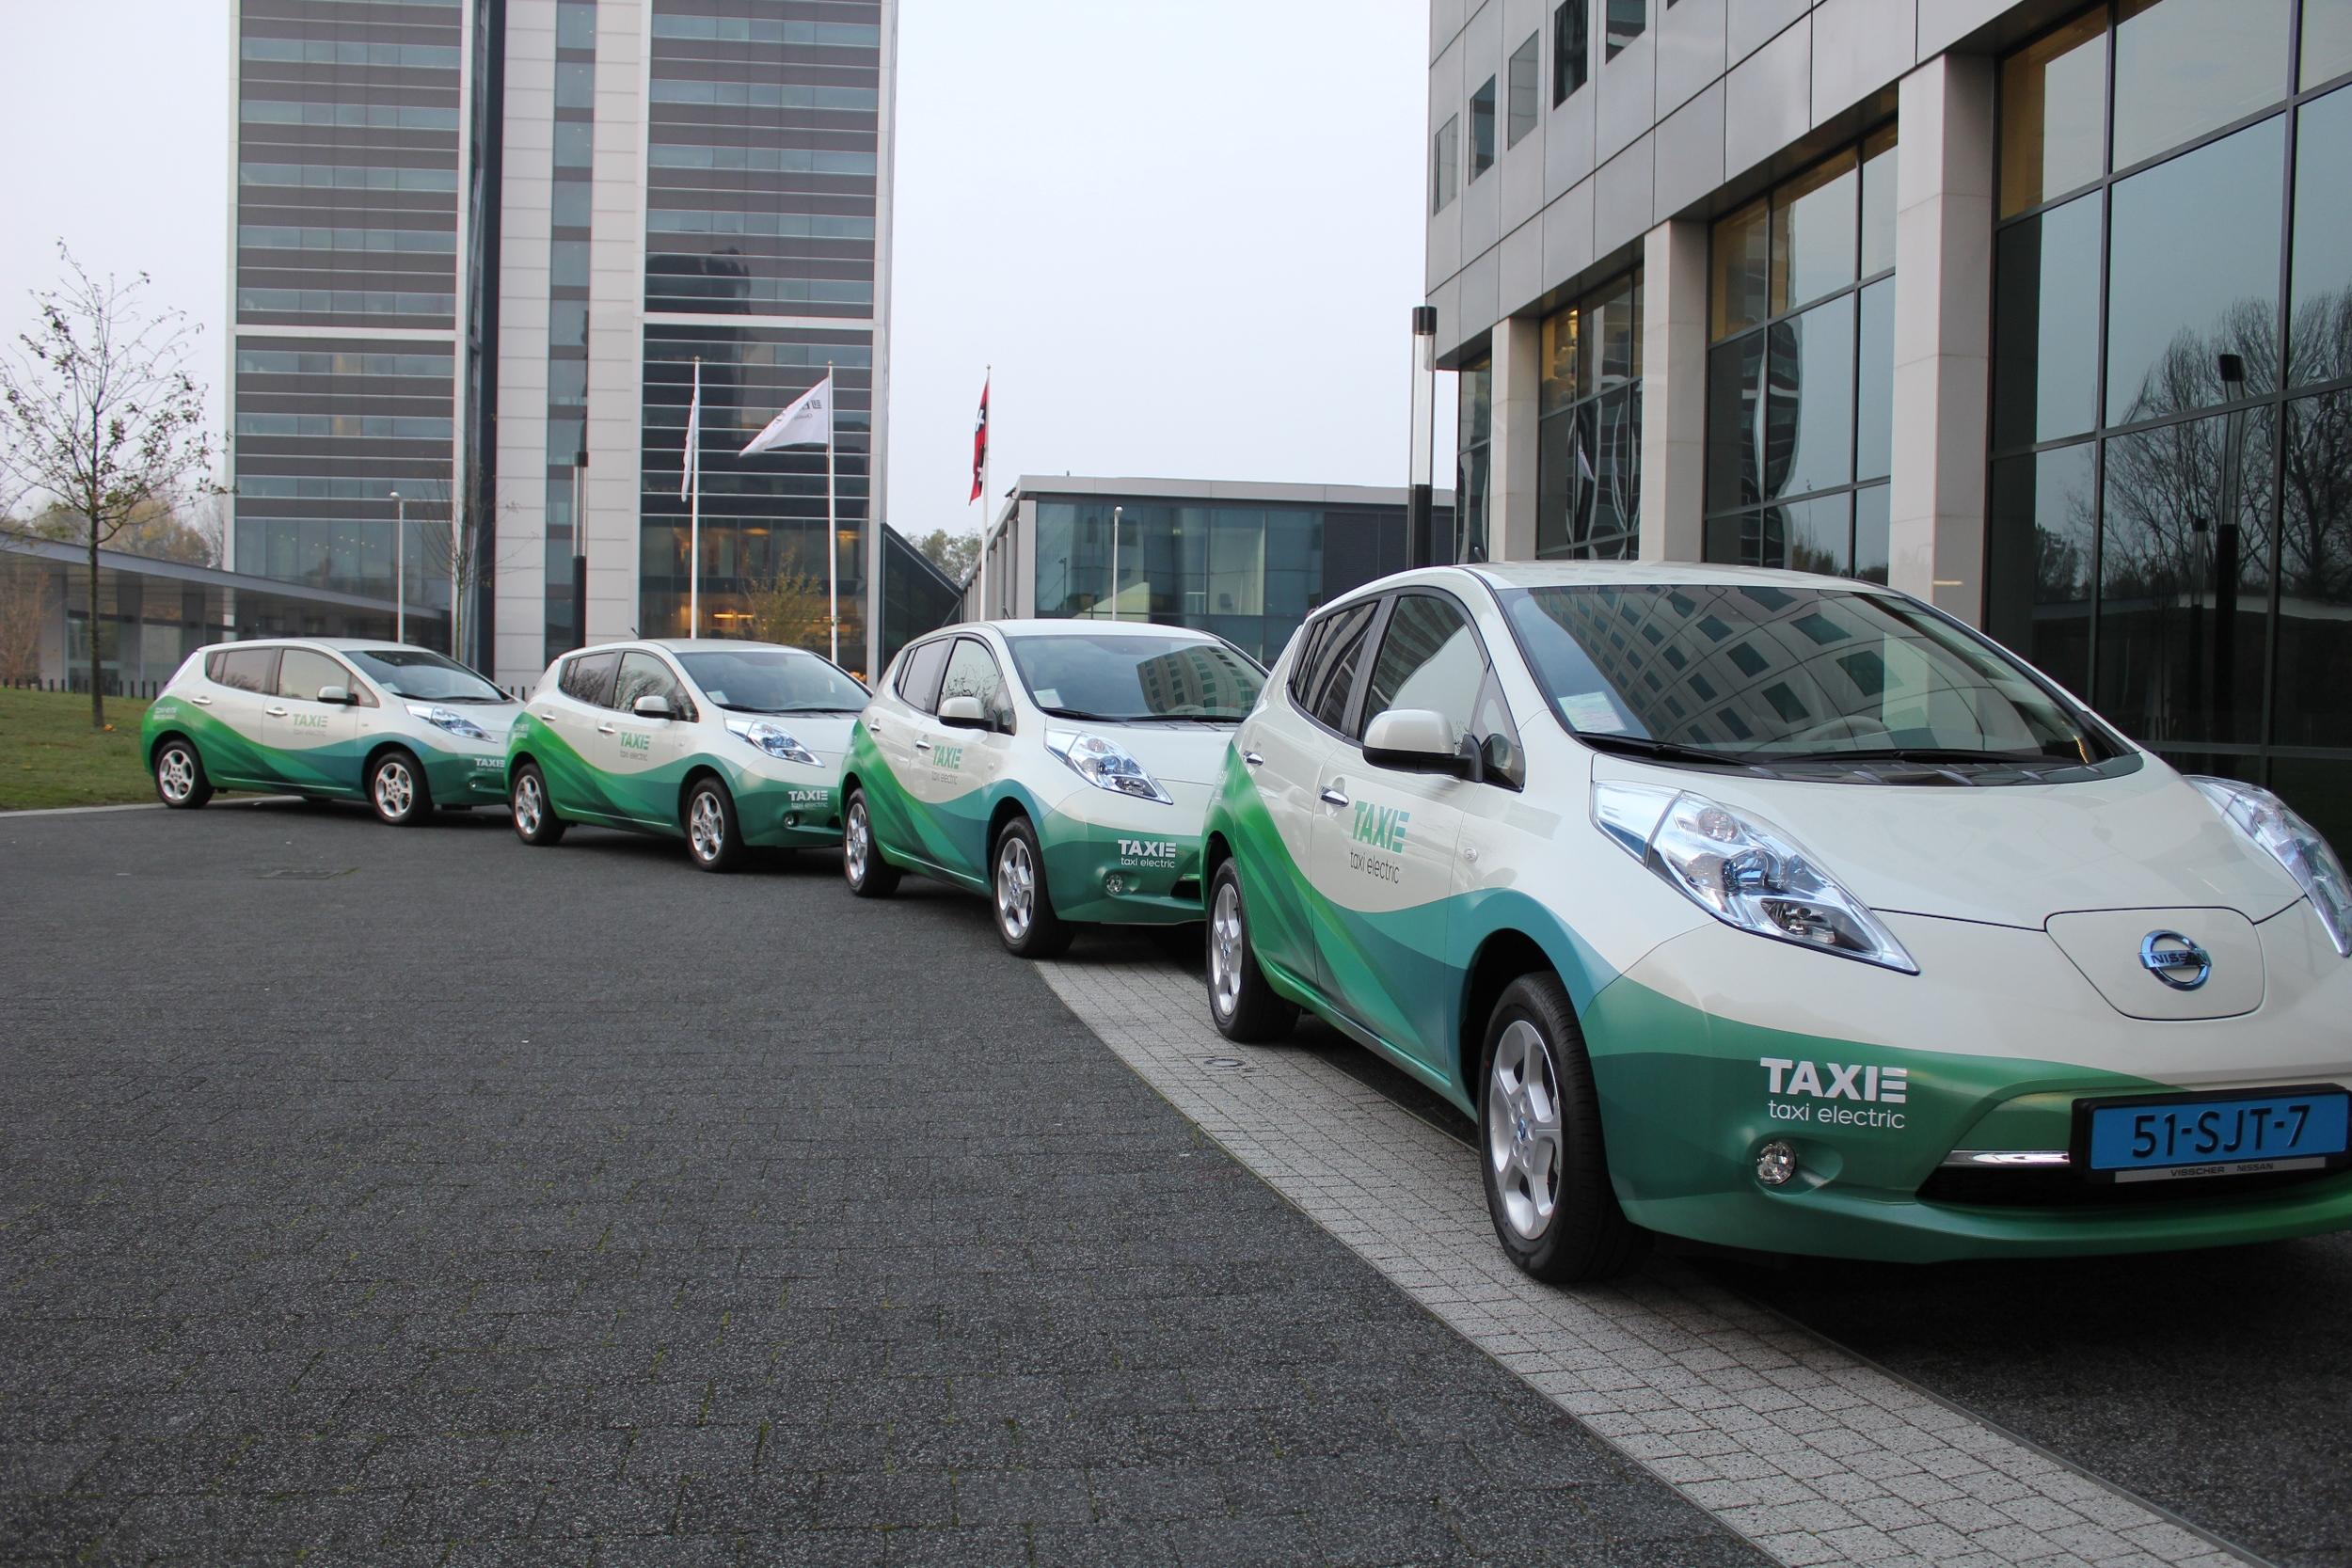 032812_taxi-e-gaat-elektrisch-rijden-tussen-Schiphol-en-Amsterdam-met-Nissan-leaf-3